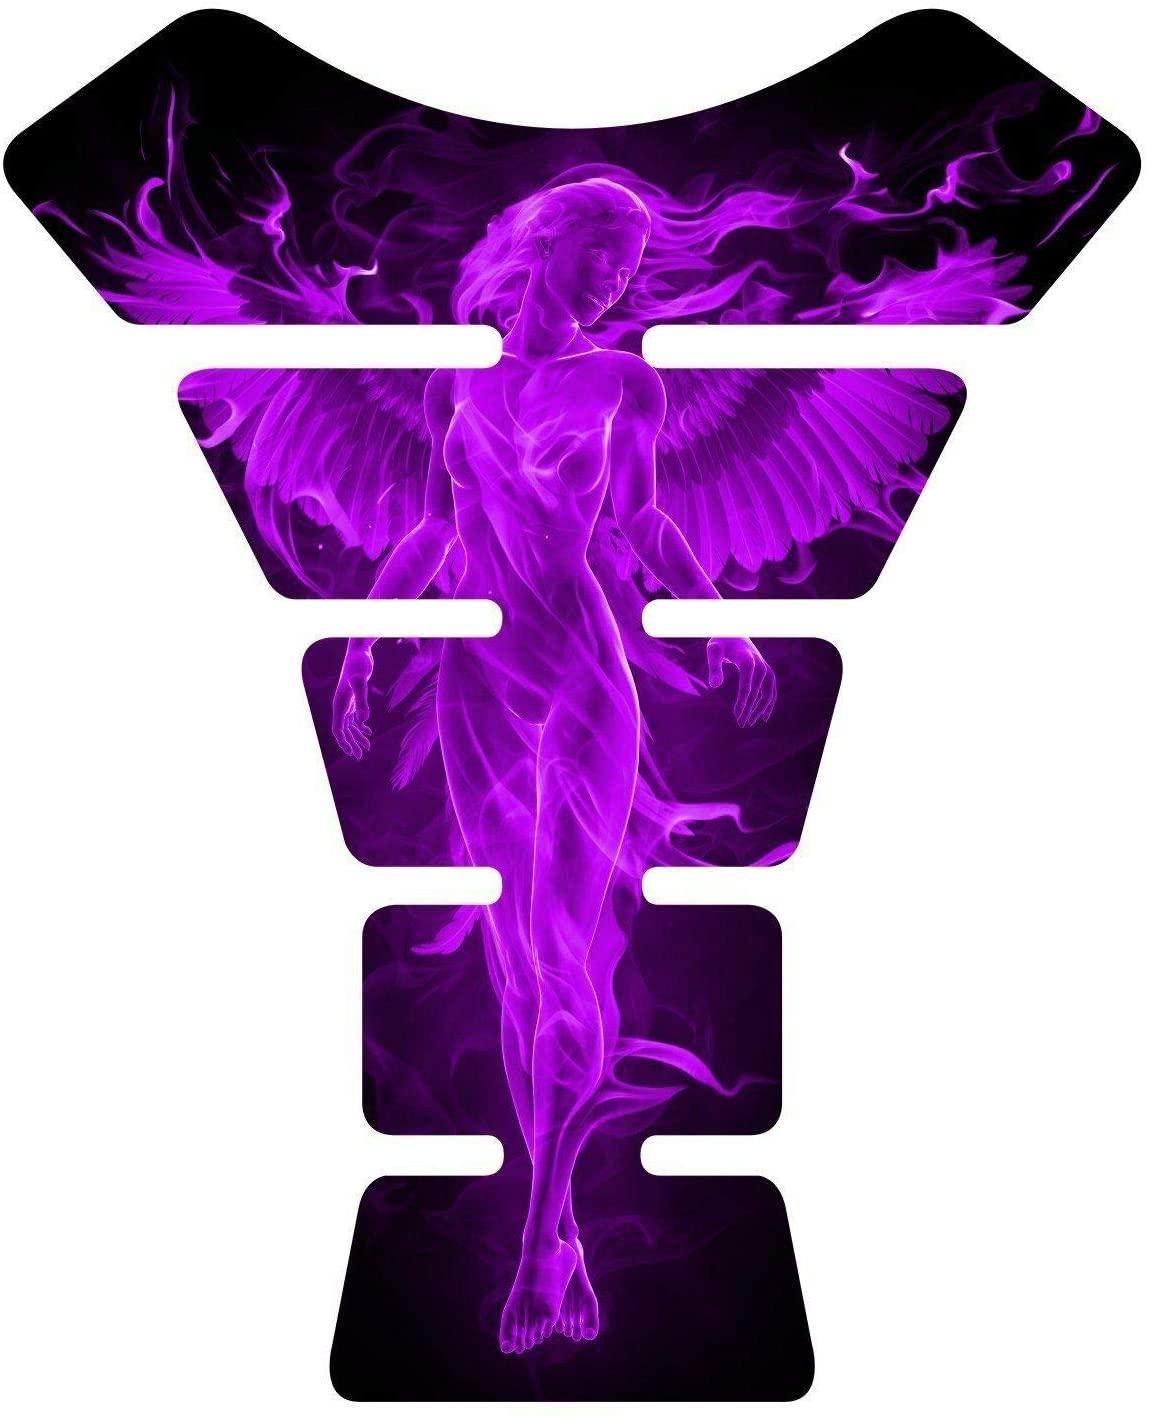 8.6 tall x 6.8 wide Flaming Fire Angel purple Yellow V2 3D Resin Gel Coating UV Resistant Motorcycle Sportbike Gel Tank Pad tankpad Protector Decal